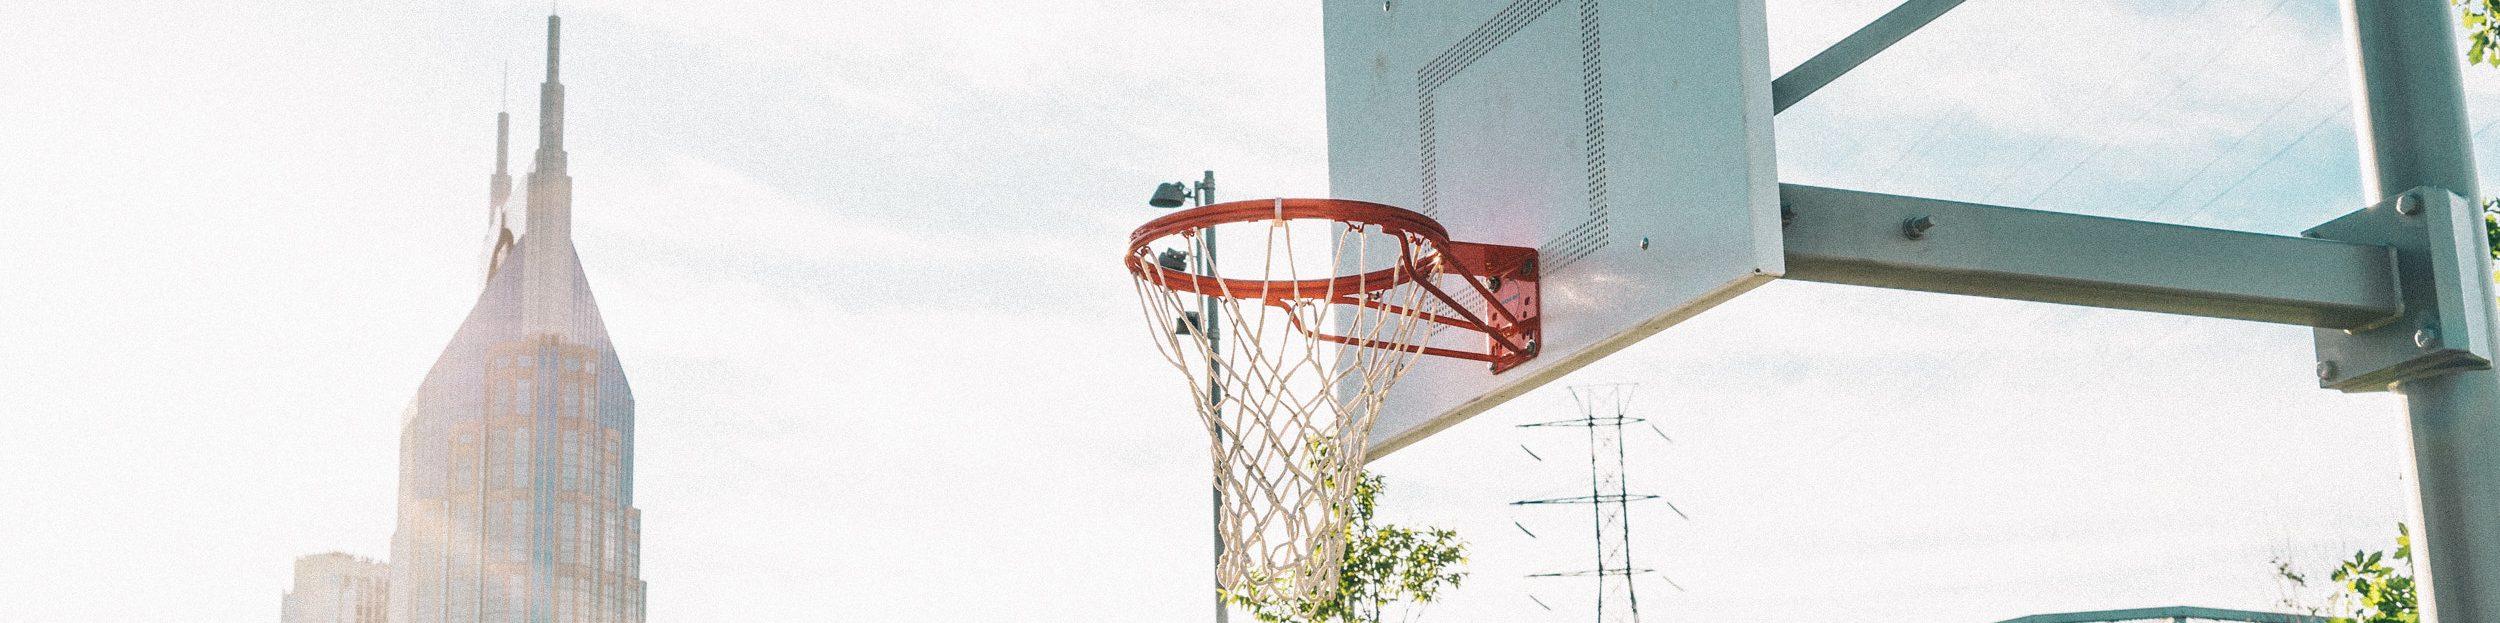 Basketbloggers